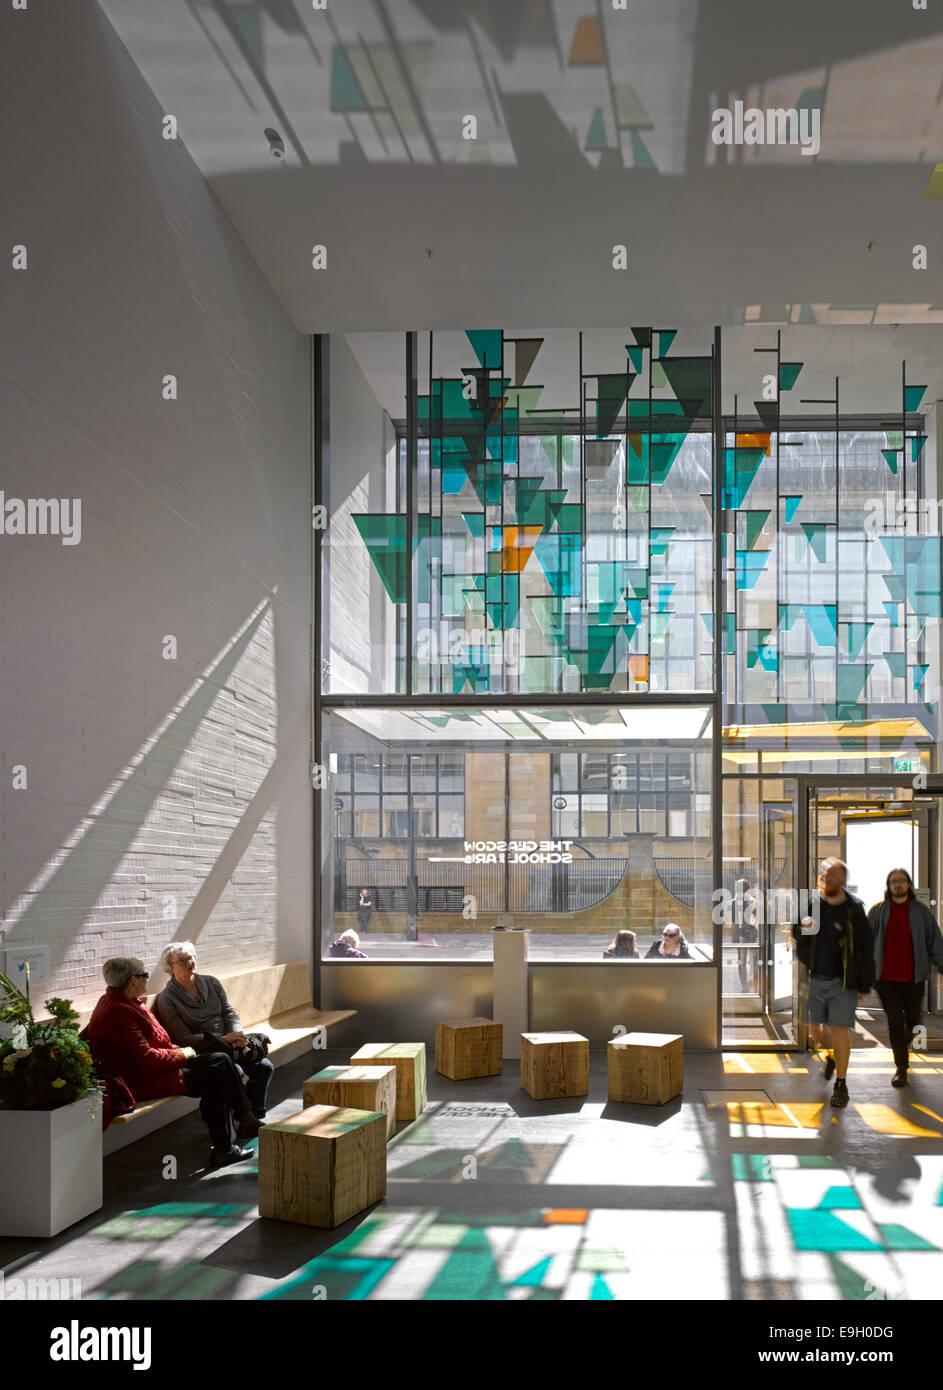 Glasgow School Of Art The Reid Building United Kingdom Architect Steven Holl 2014 Interior View Entrance Lobby